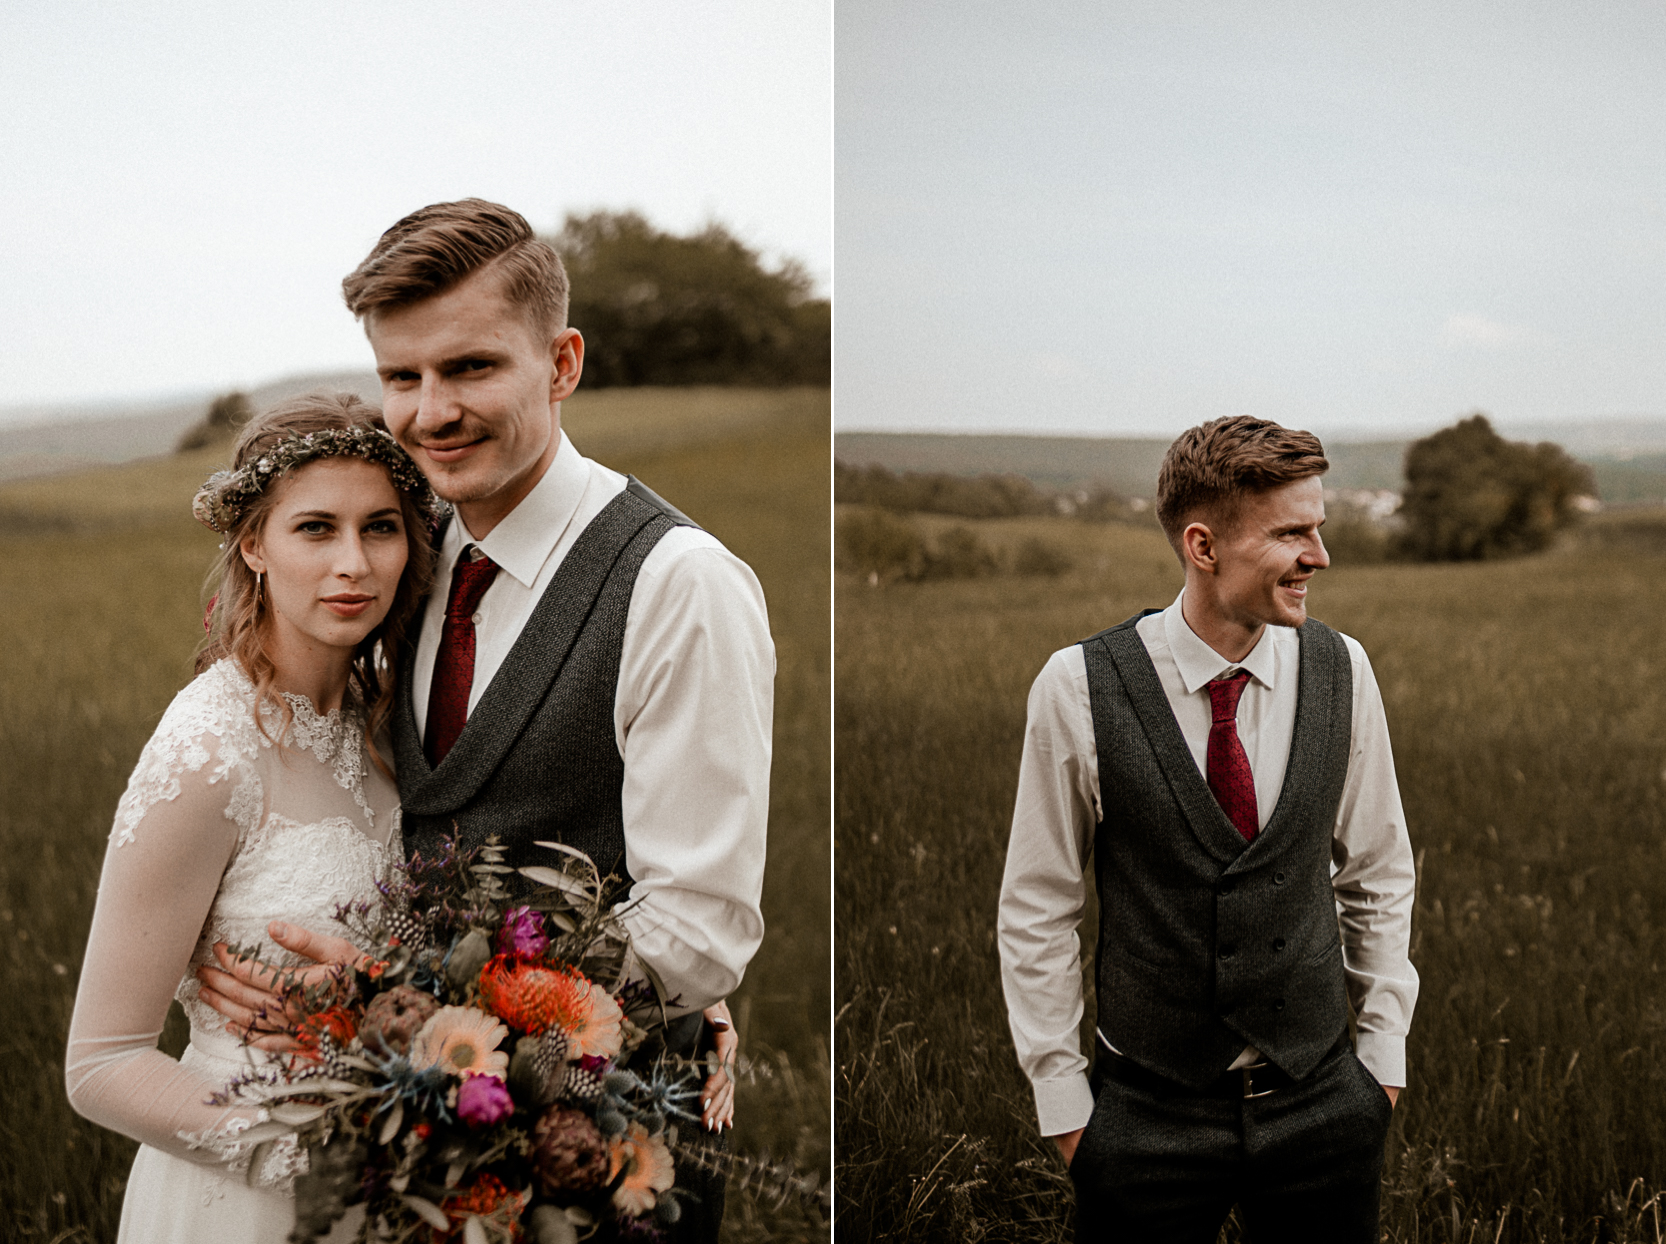 wholeheartedweddings-TimoMatthies-weddingphotography-moody-Melanie-Henrick-Mannheim-082.jpg